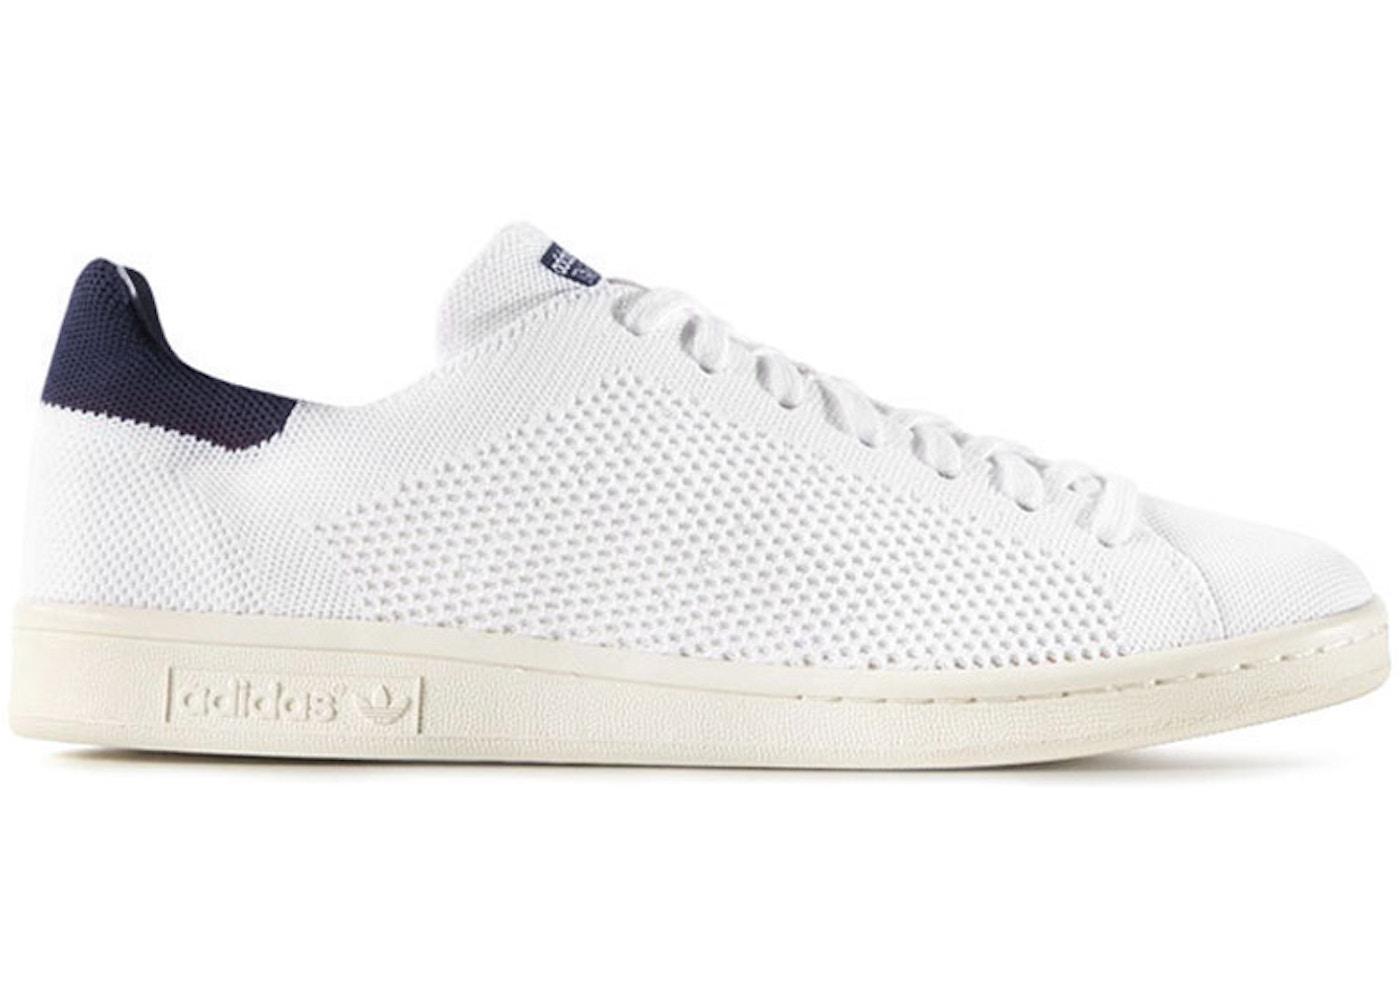 timeless design 86c4a 7bbe2 adidas Stan Smith Primeknit White Blue